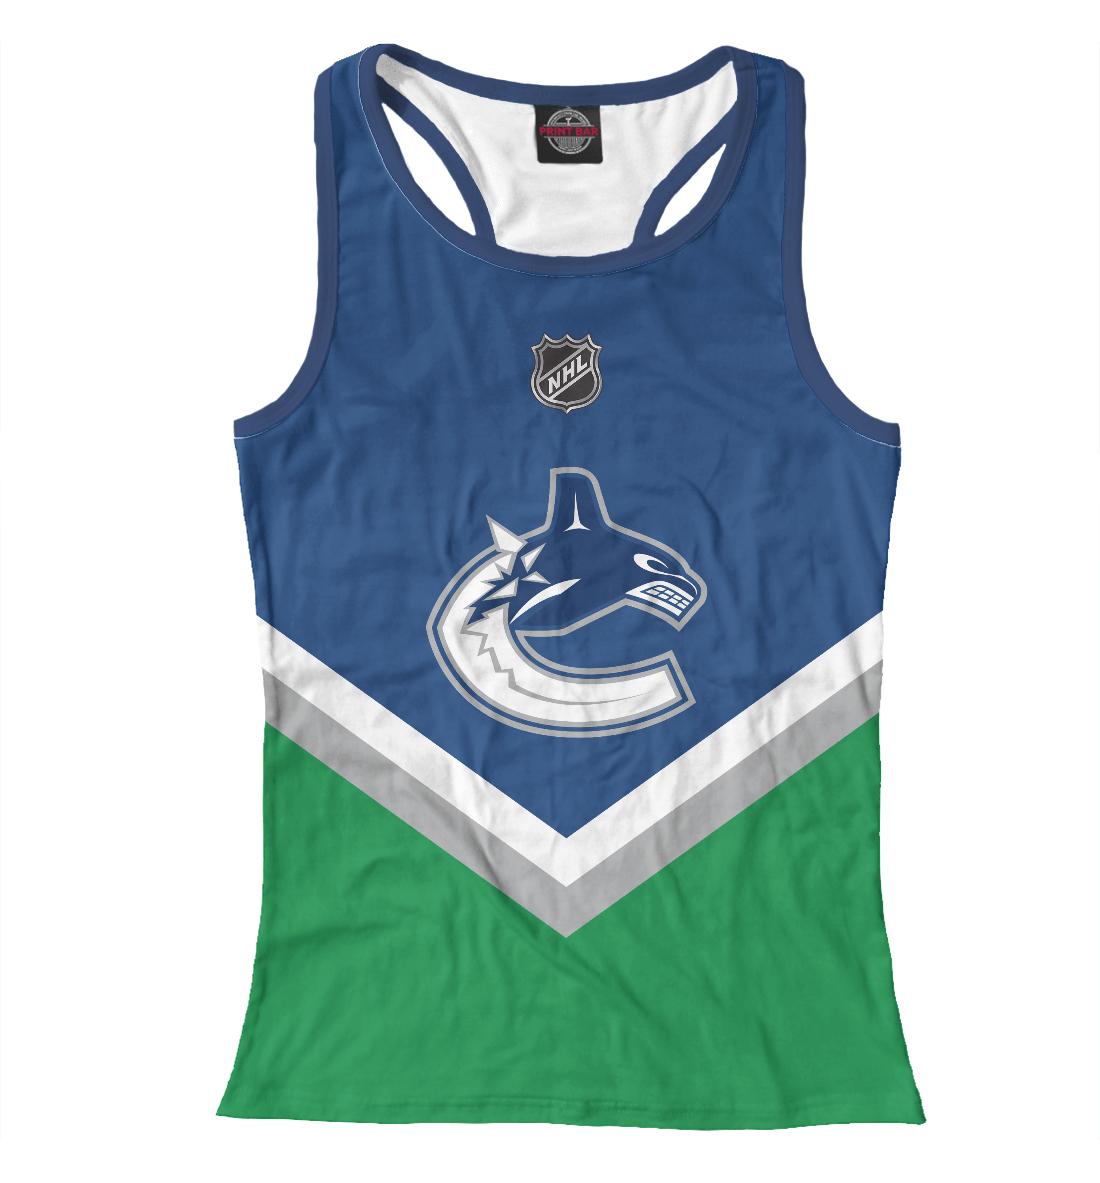 Купить Vancouver Canucks, Printbar, Майки борцовки, HOK-861094-mayb-1